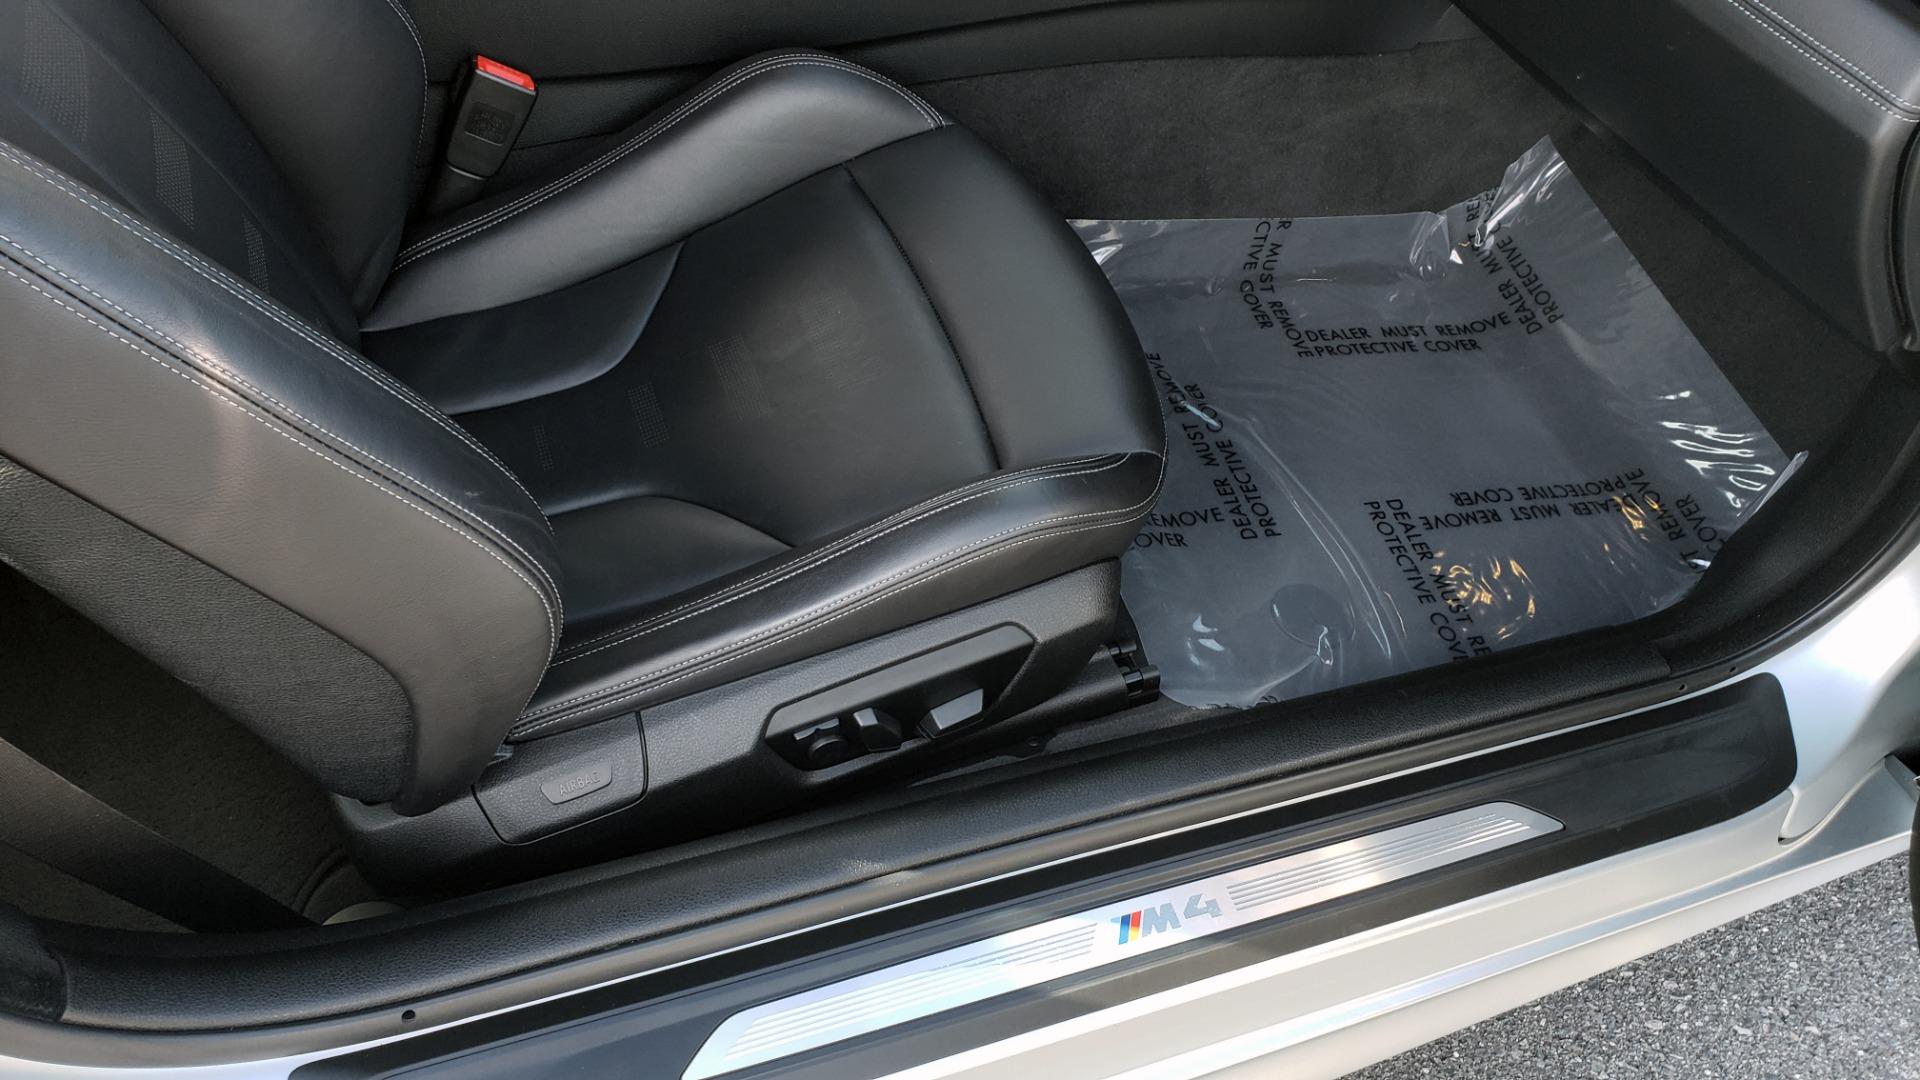 Used 2015 BMW M4 COUPE / EXEC PKG / DRVR ASST PLUS / LIGHTING / M-SUSPENSION for sale Sold at Formula Imports in Charlotte NC 28227 75